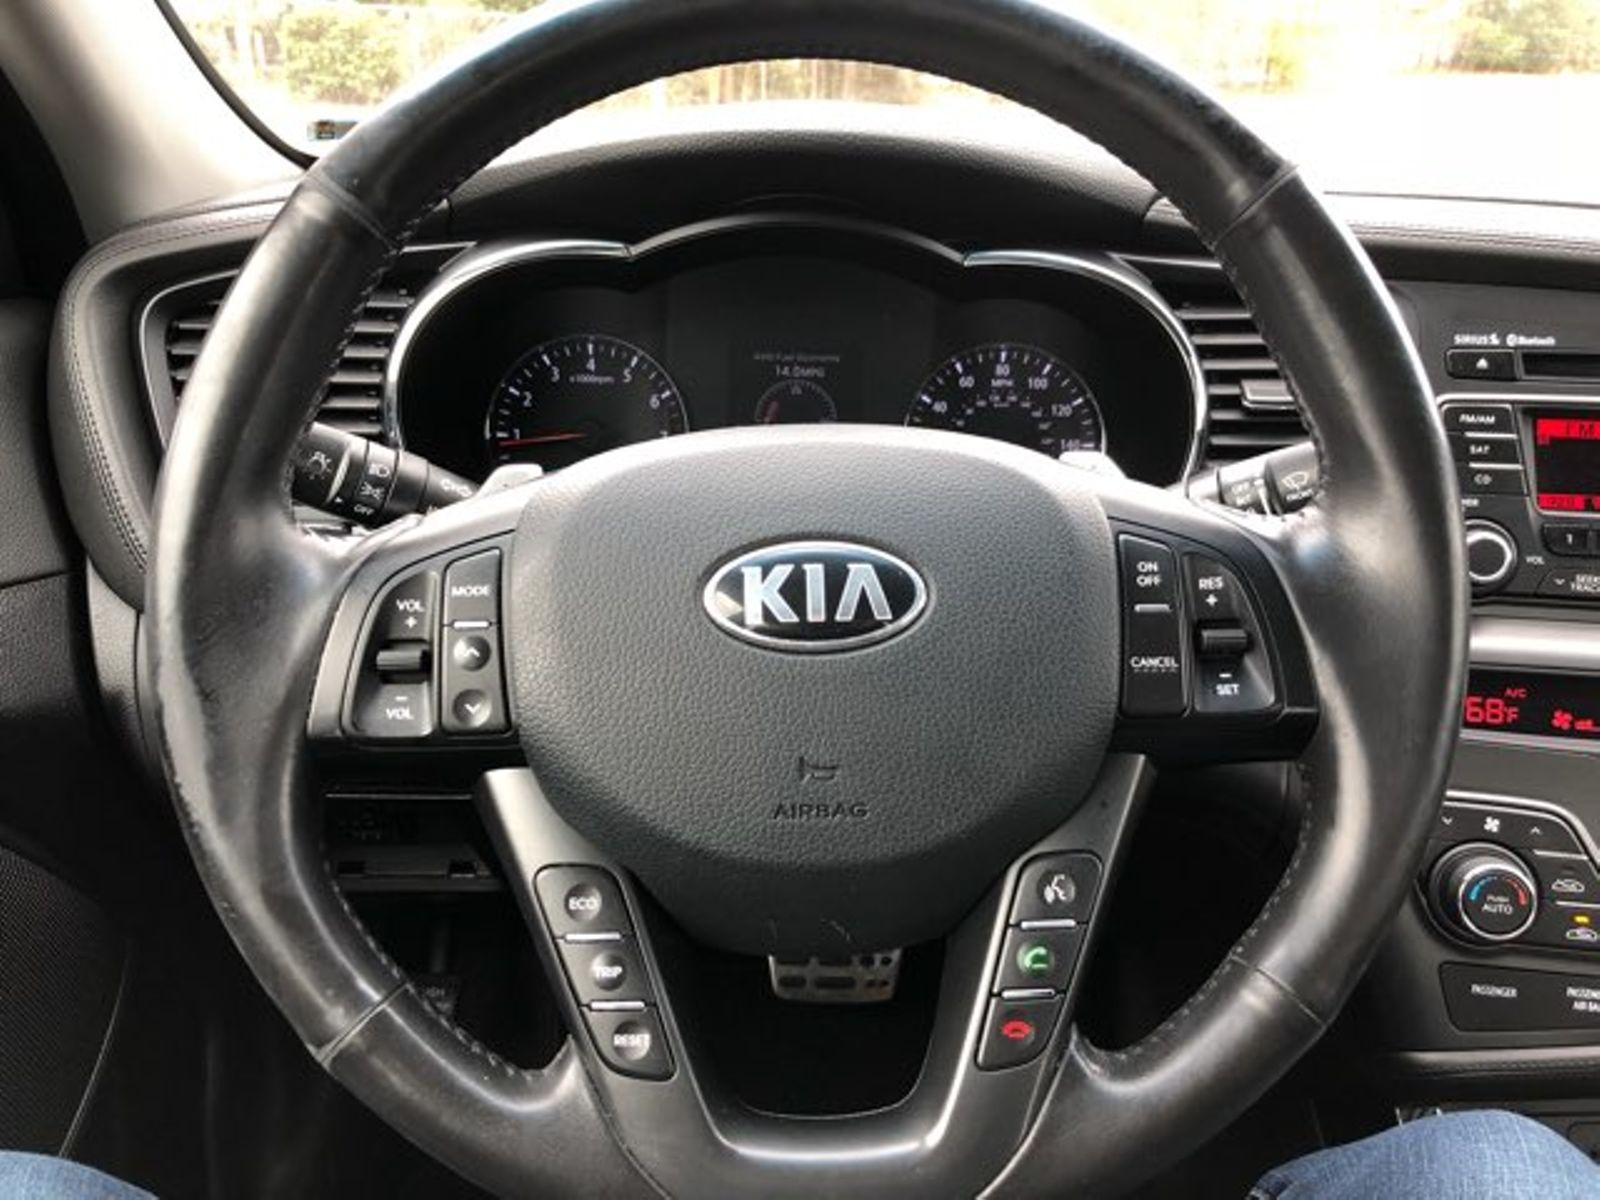 in roseville pre owned kia sx inventory sedan used fwd optima